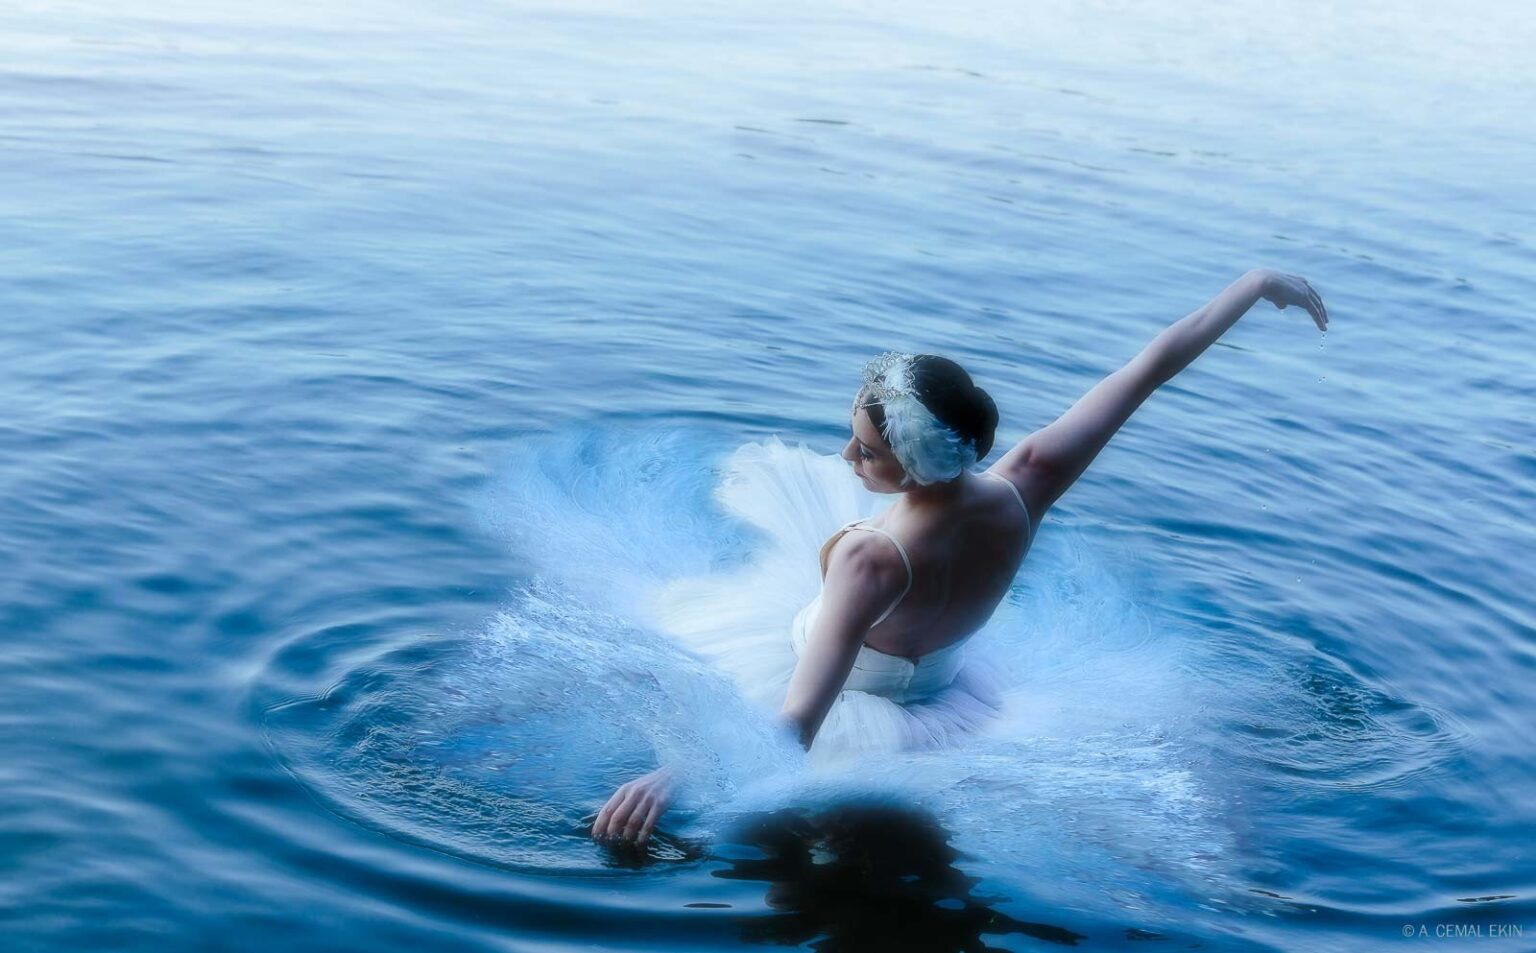 Vilia Putrius, Odette, Swan Lake (Luster or Gloss)